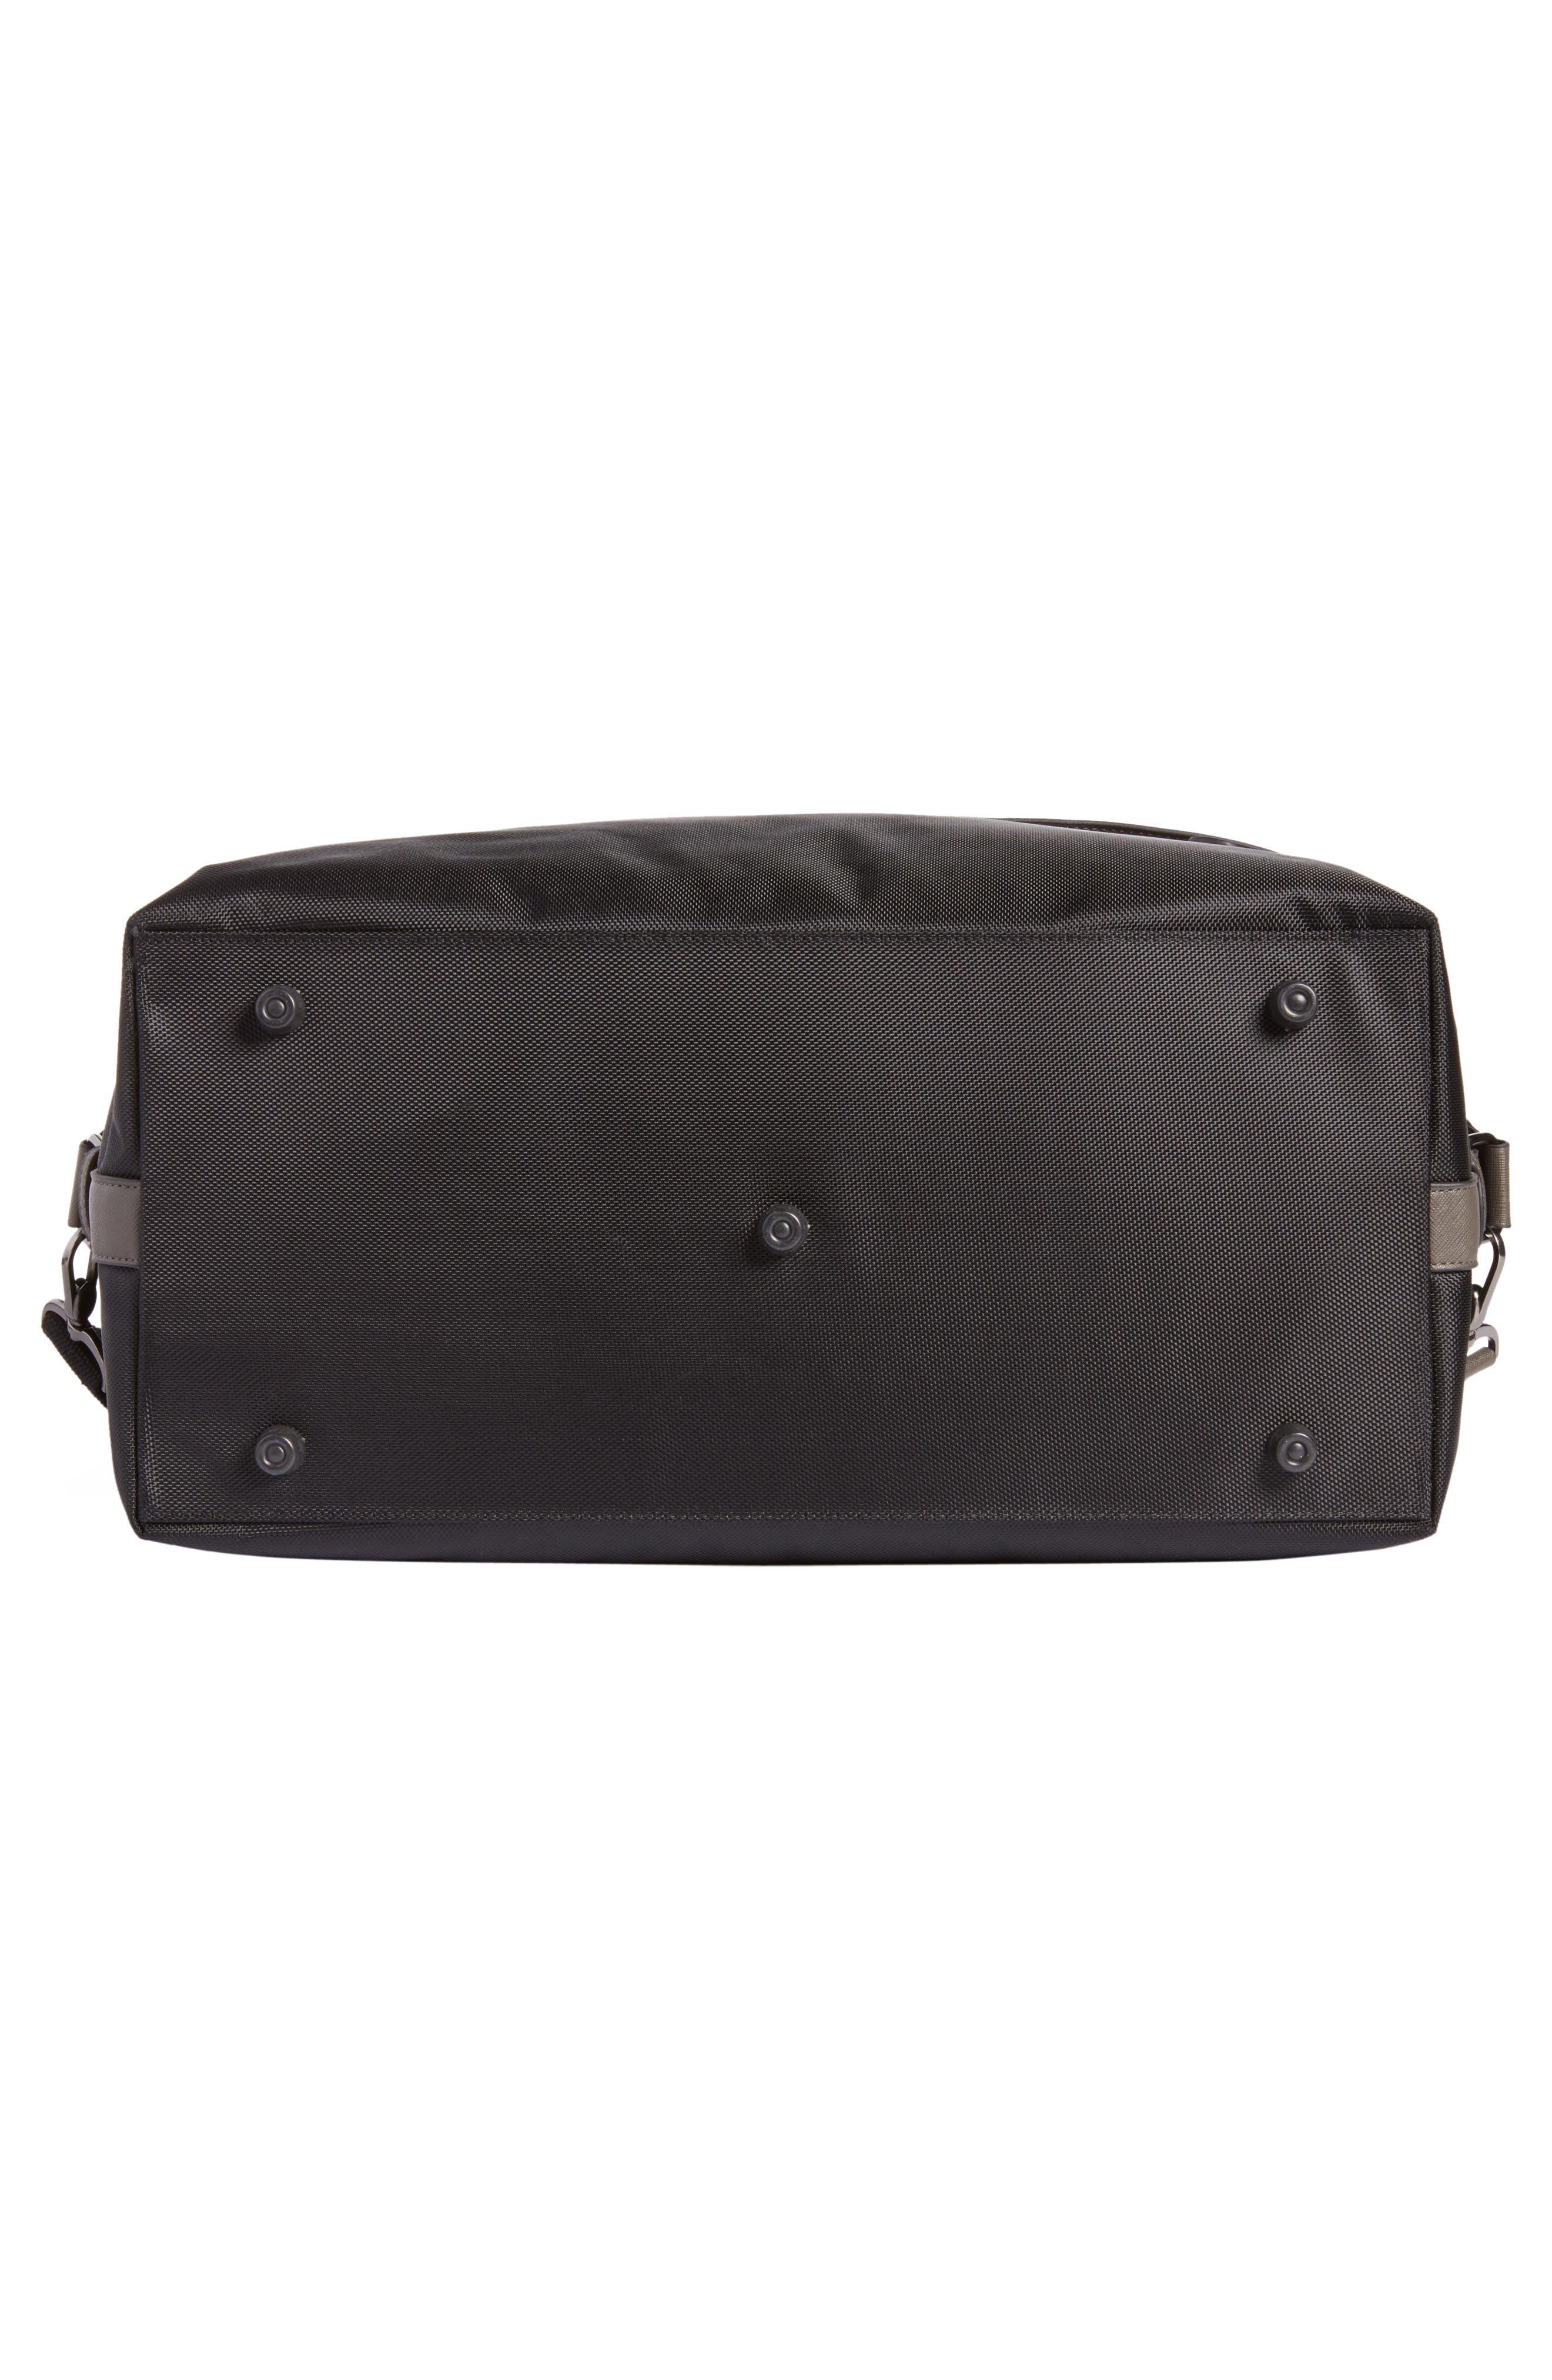 Zeebee Duffel Bag,                             Alternate thumbnail 6, color,                             Black